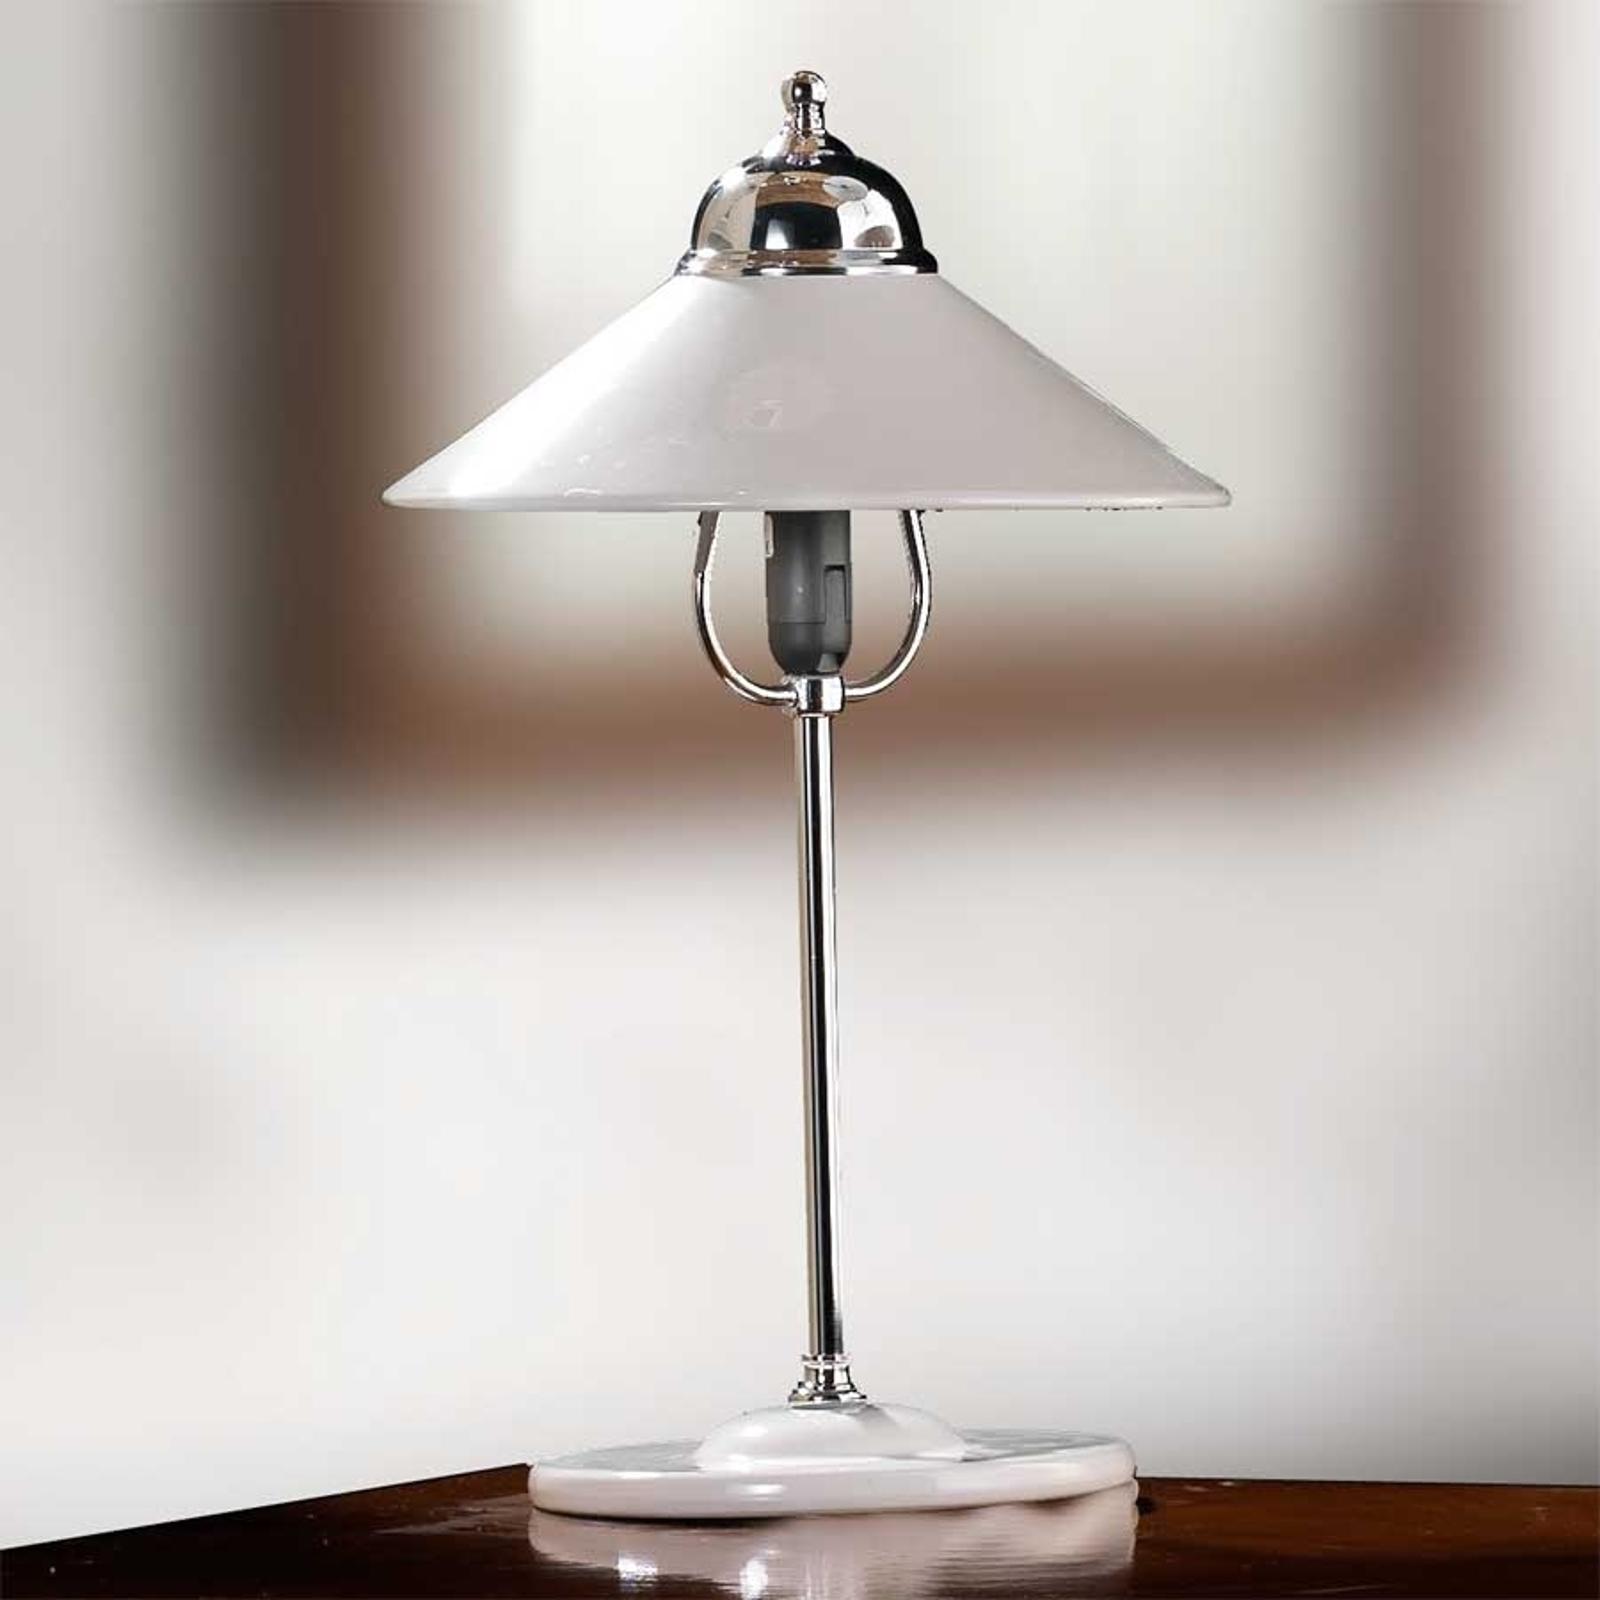 Bordslampa GIACOMO med keramikskärm